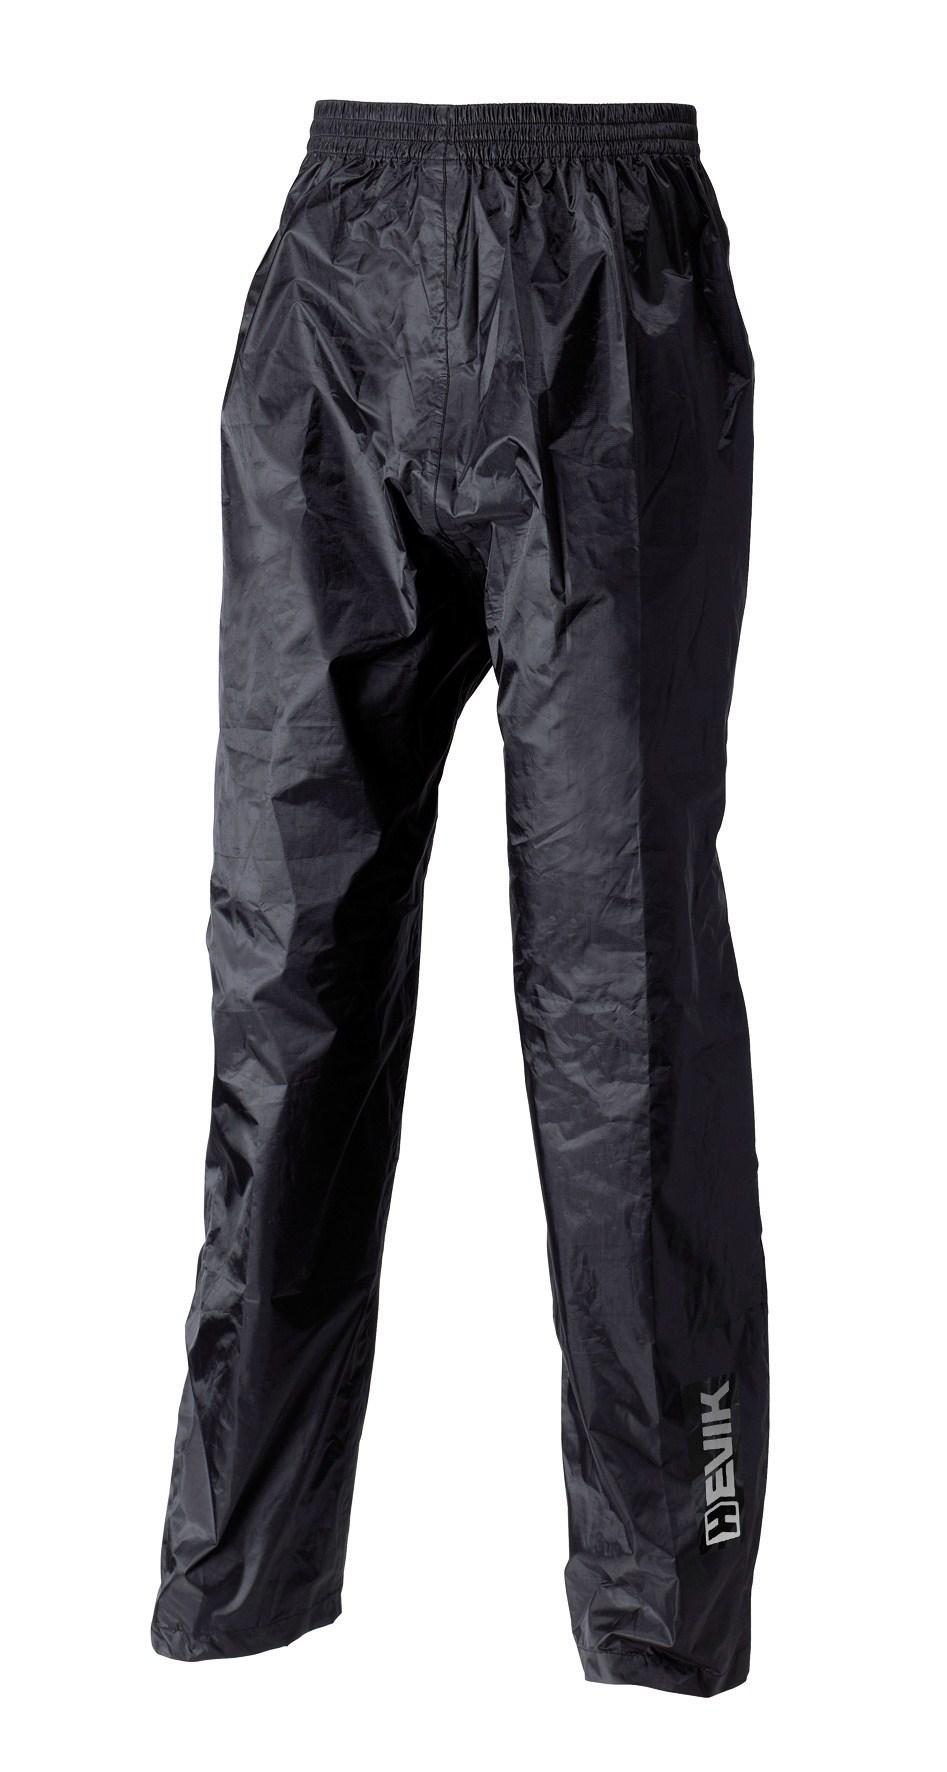 Hevik Dry Rain Pants Light Black Rain